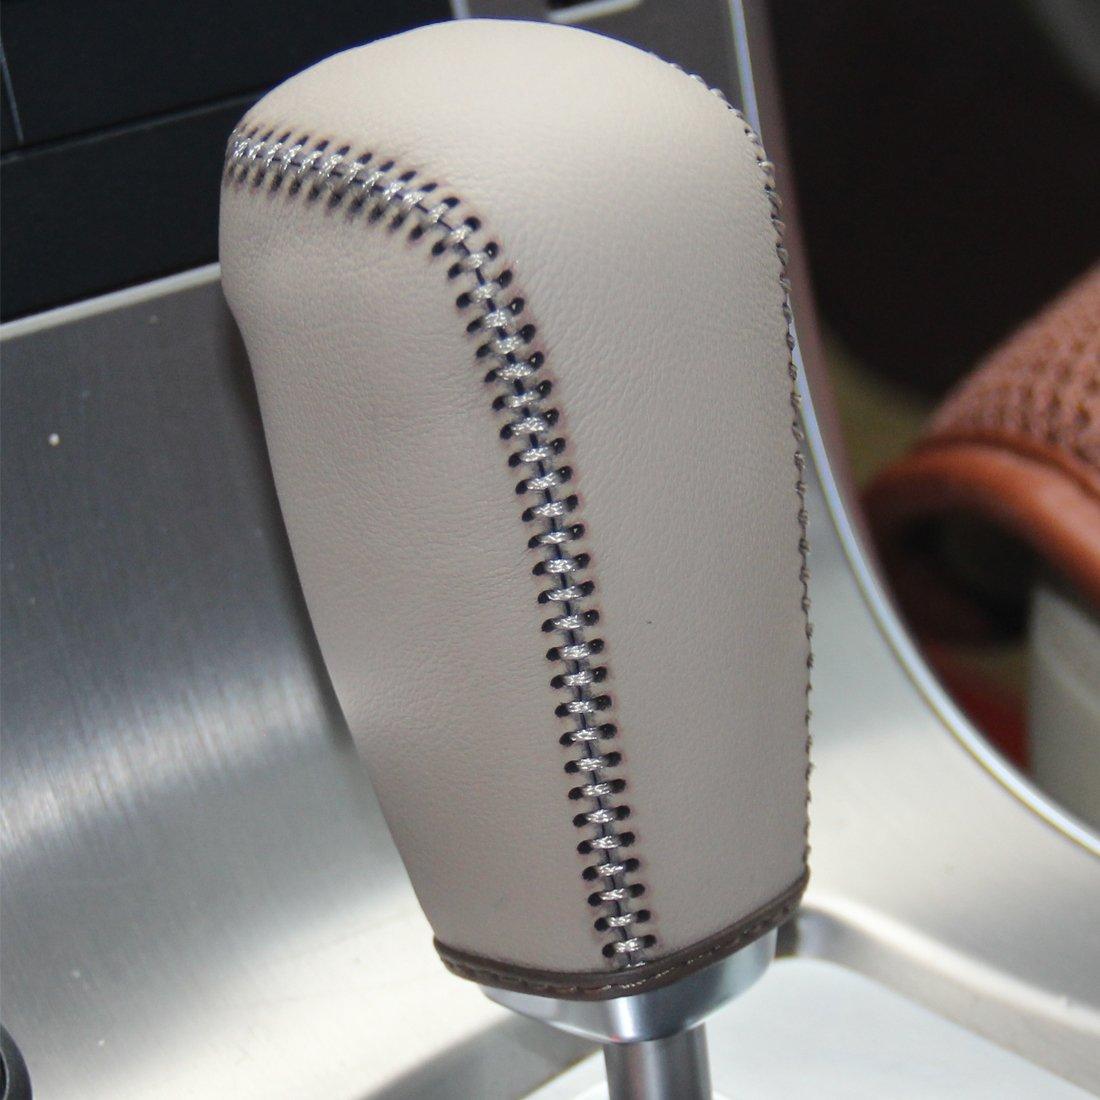 2007 2008 2009 2010 2011 2012 Volvo S80 2008 2009 2010 Volvo V70 2008-2012 Volvo XC70 Automatic JI Loncky Genuine Leather Gear Shift Knob Cover for 2011 2012 Volvo S60 2010-2012 Volvo XC60